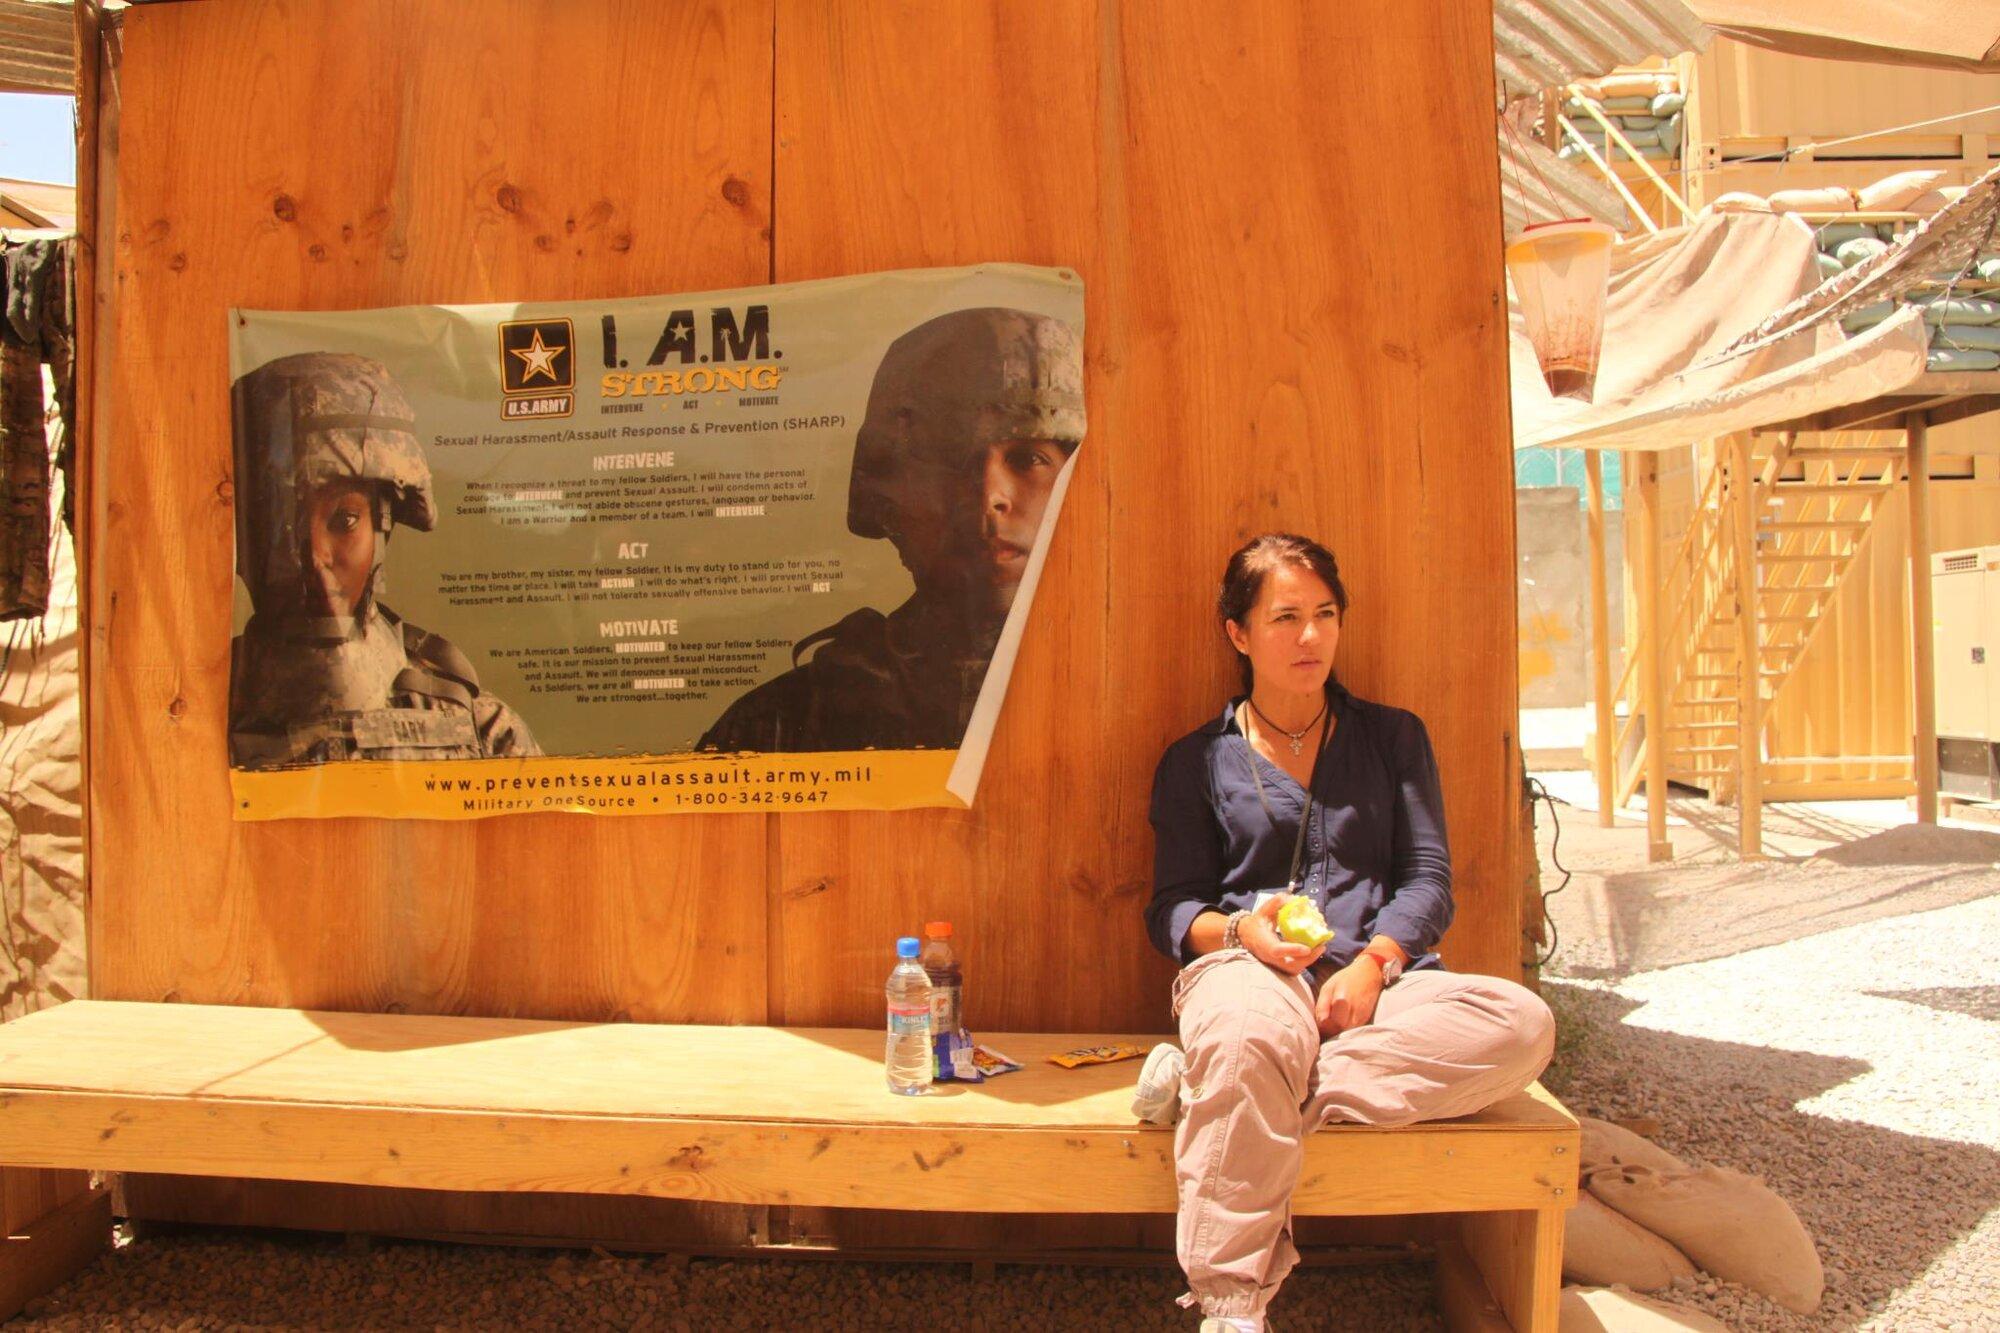 Marisa Perello na misi v Afghánistánu. Soukromý archiv Marisy